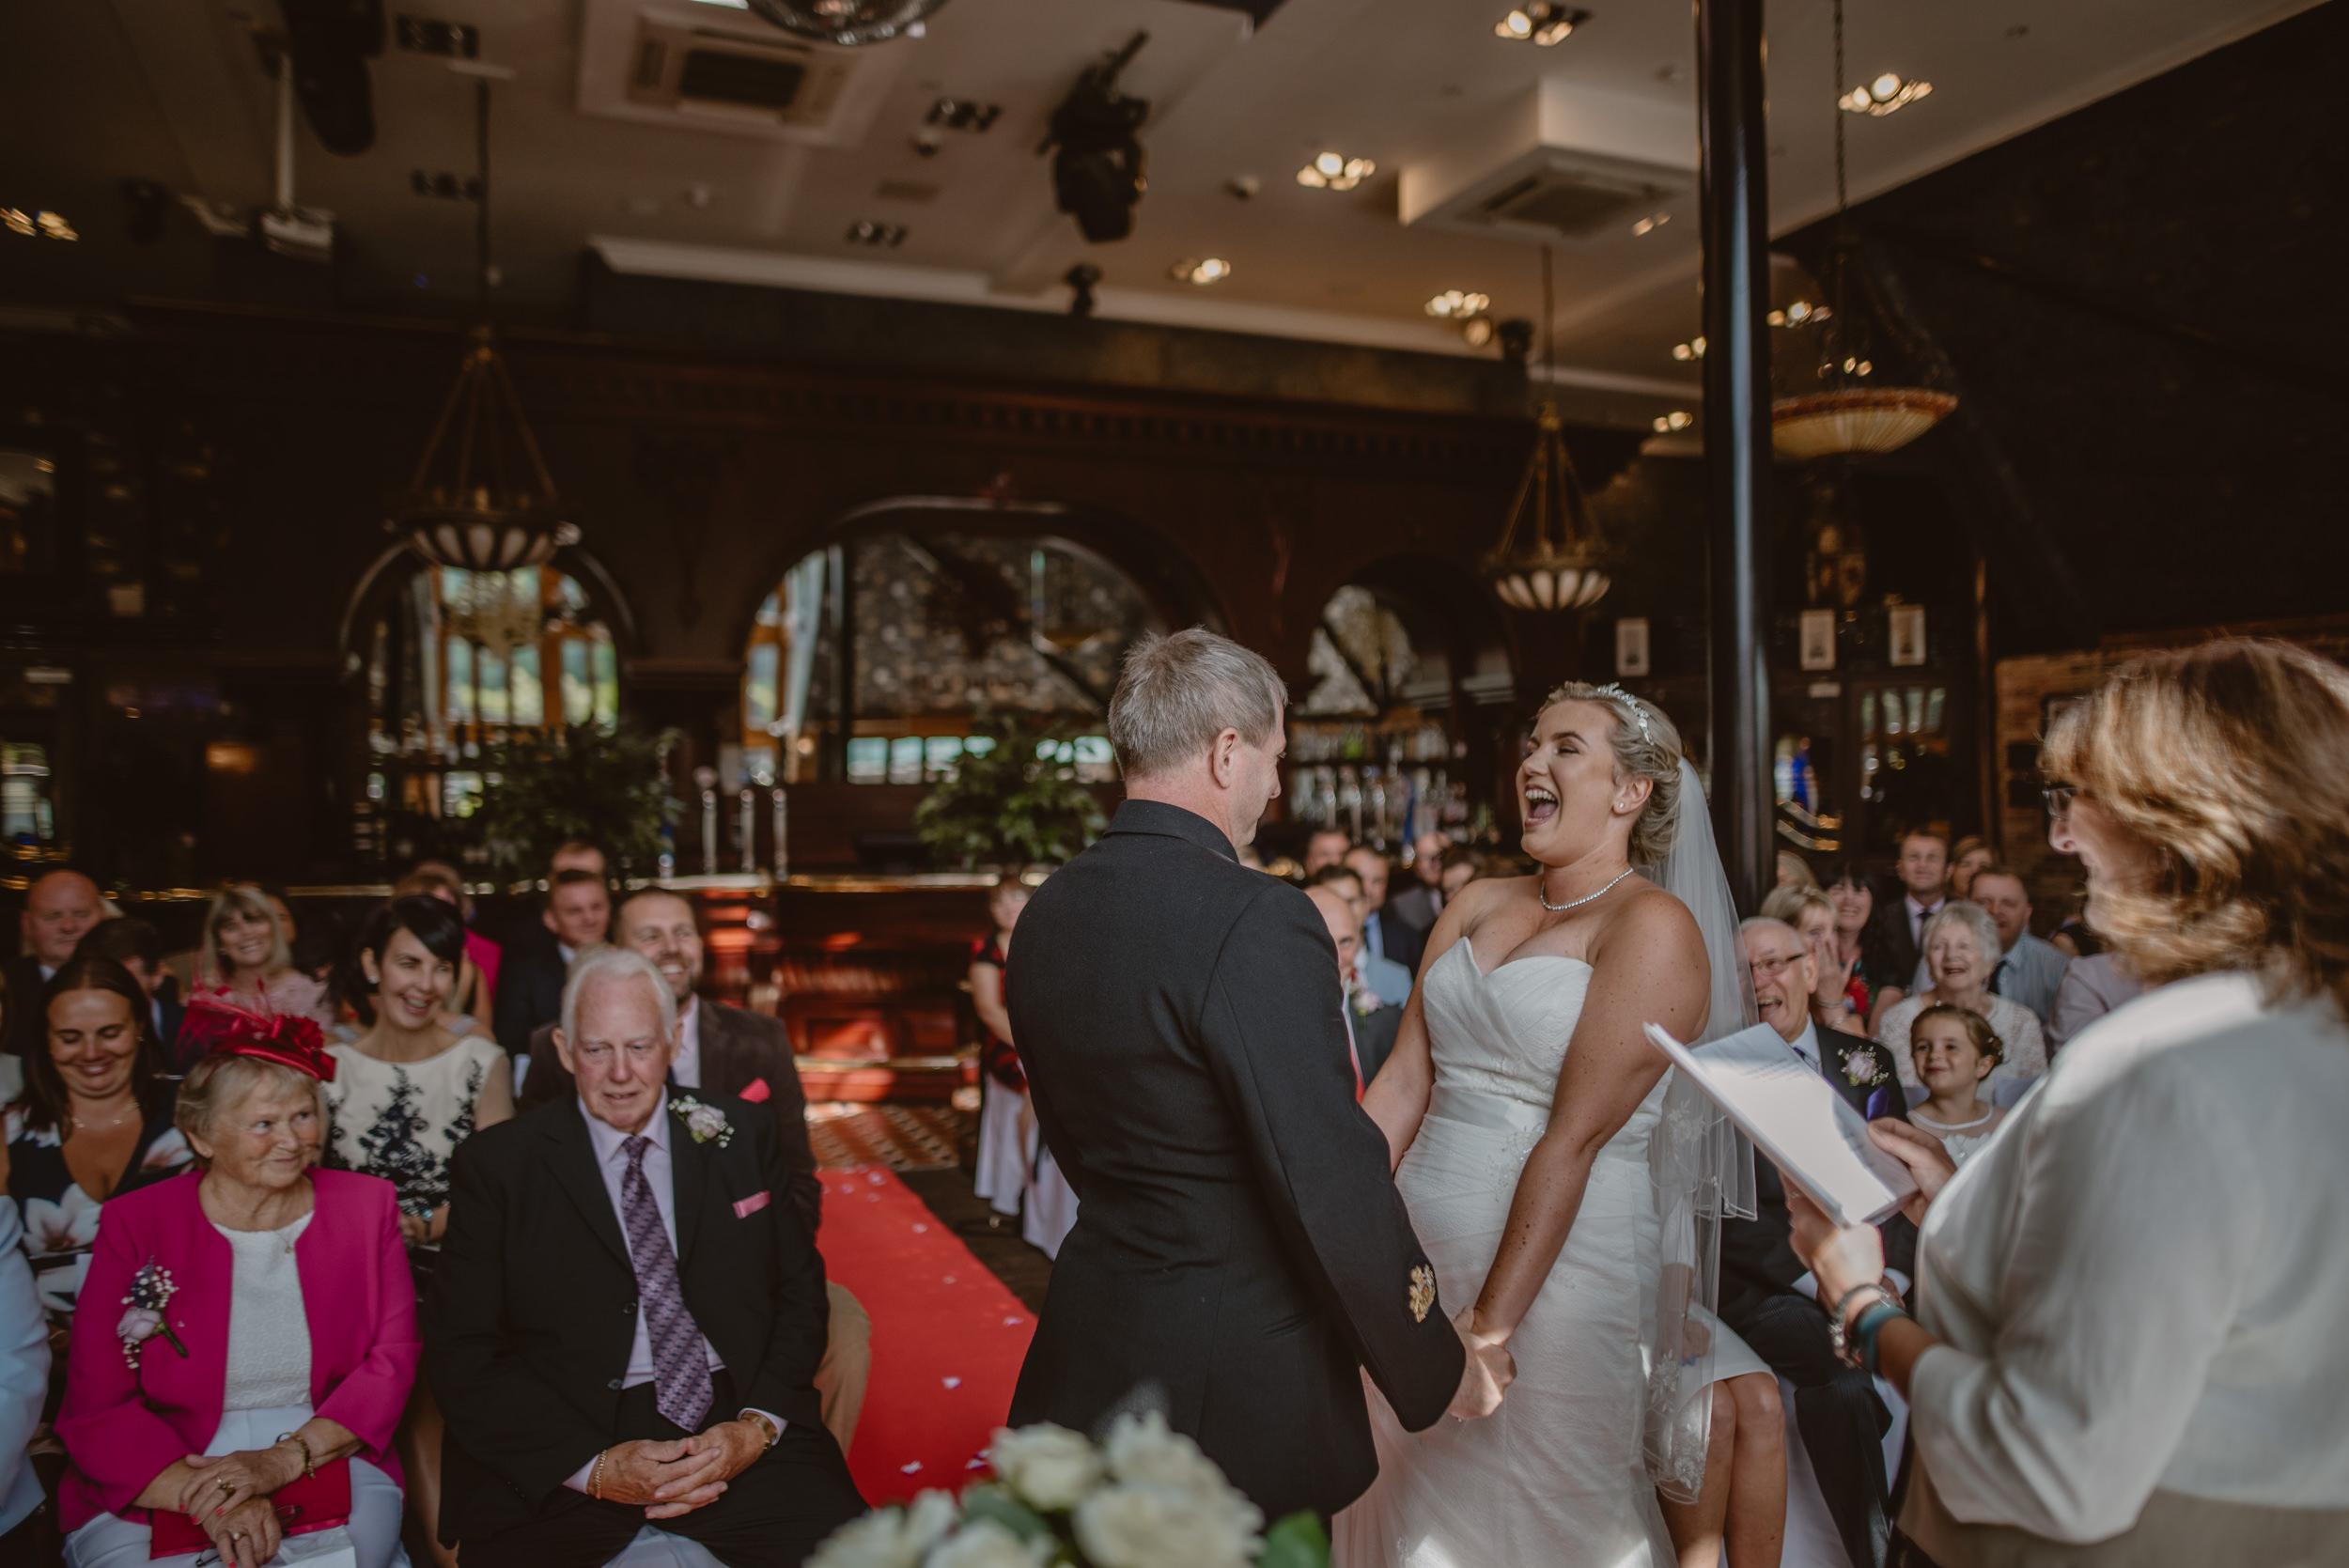 Chantelle-and-Stephen-Old-Thorns-Hotel-Wedding-Liphook-Manu-Mendoza-Wedding-Photography-206.jpg